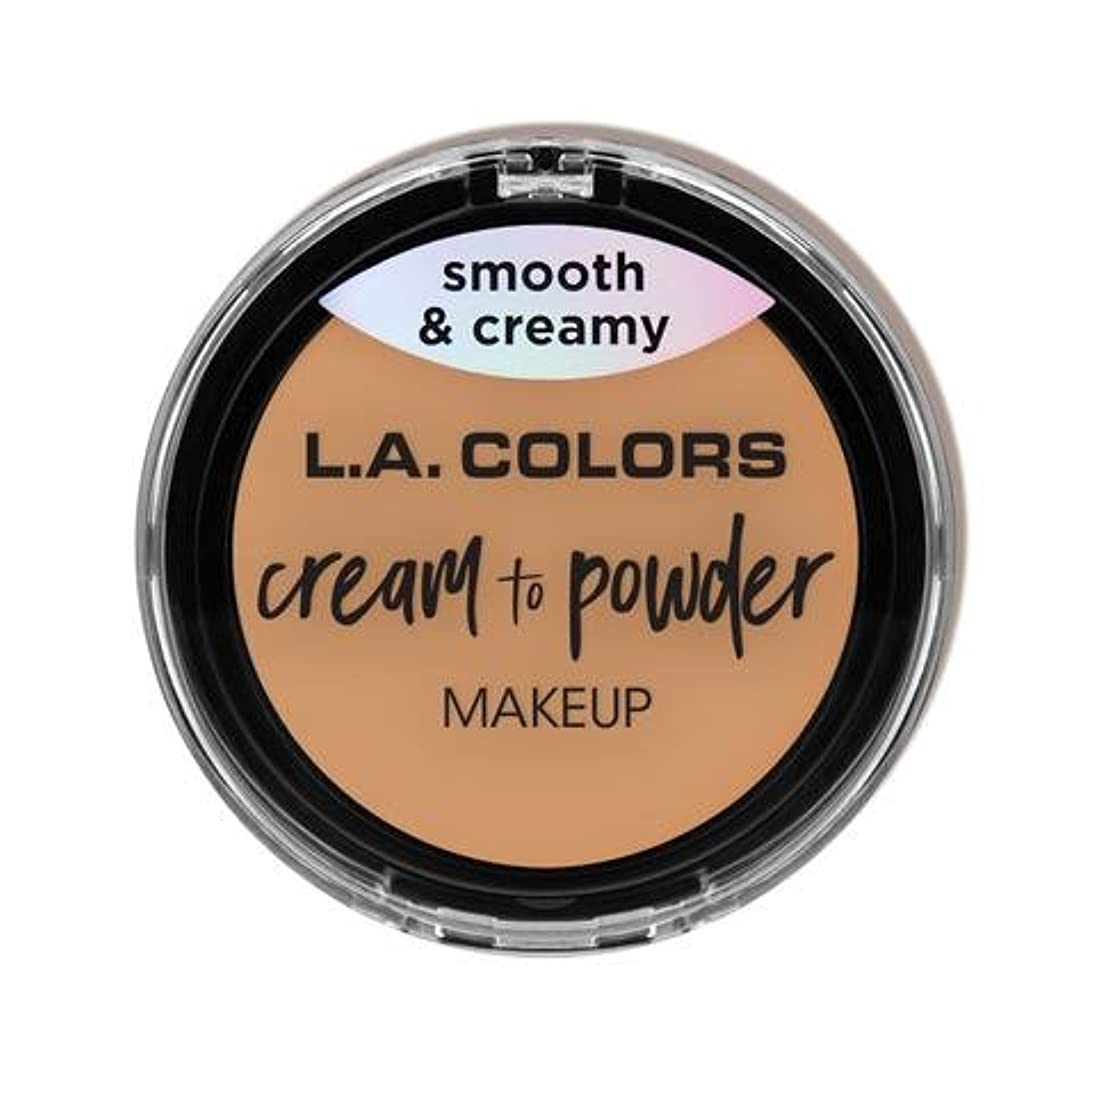 (6 Pack) L.A. COLORS Cream To Powder Foundation - Honey Beige (並行輸入品)